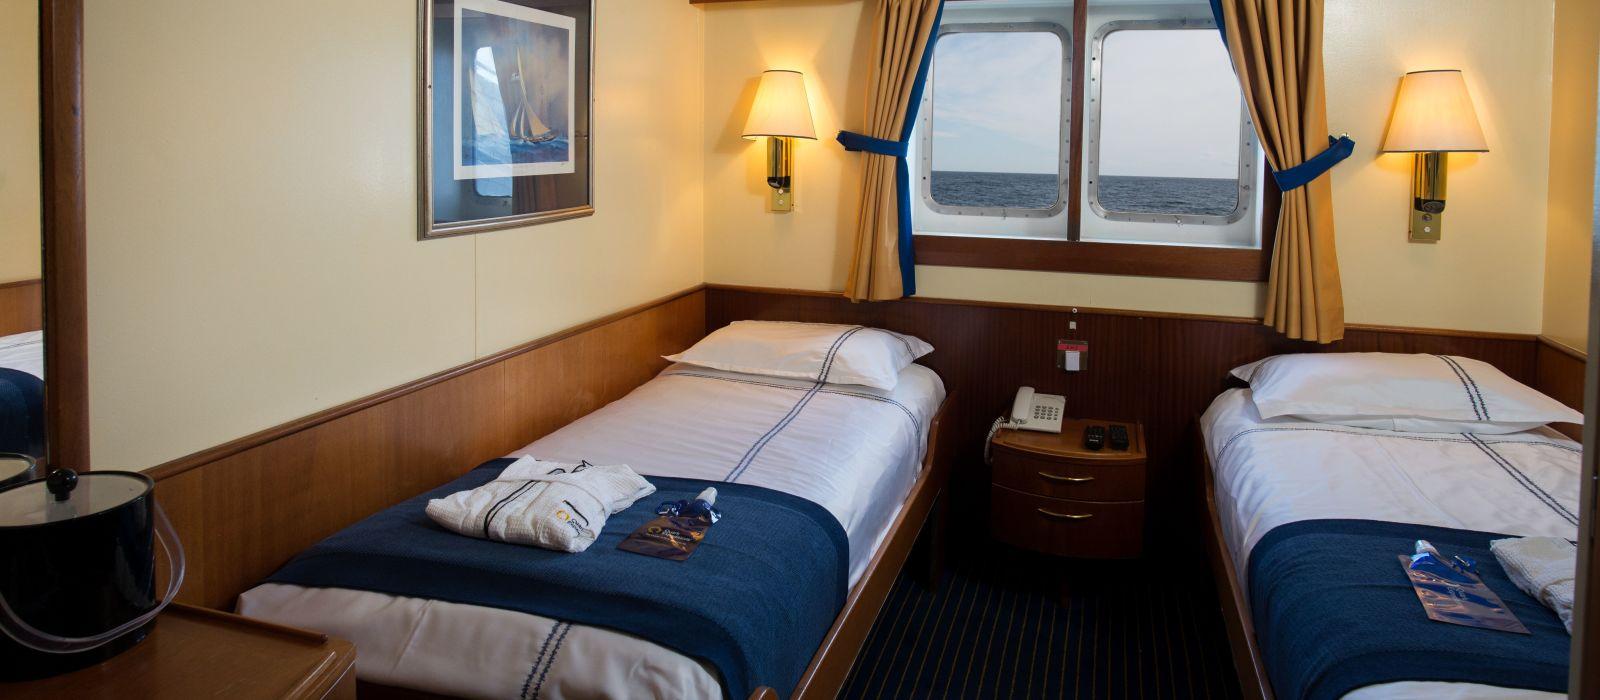 Hotel Ocean Adventurer by Quark Expeditions Antarctica